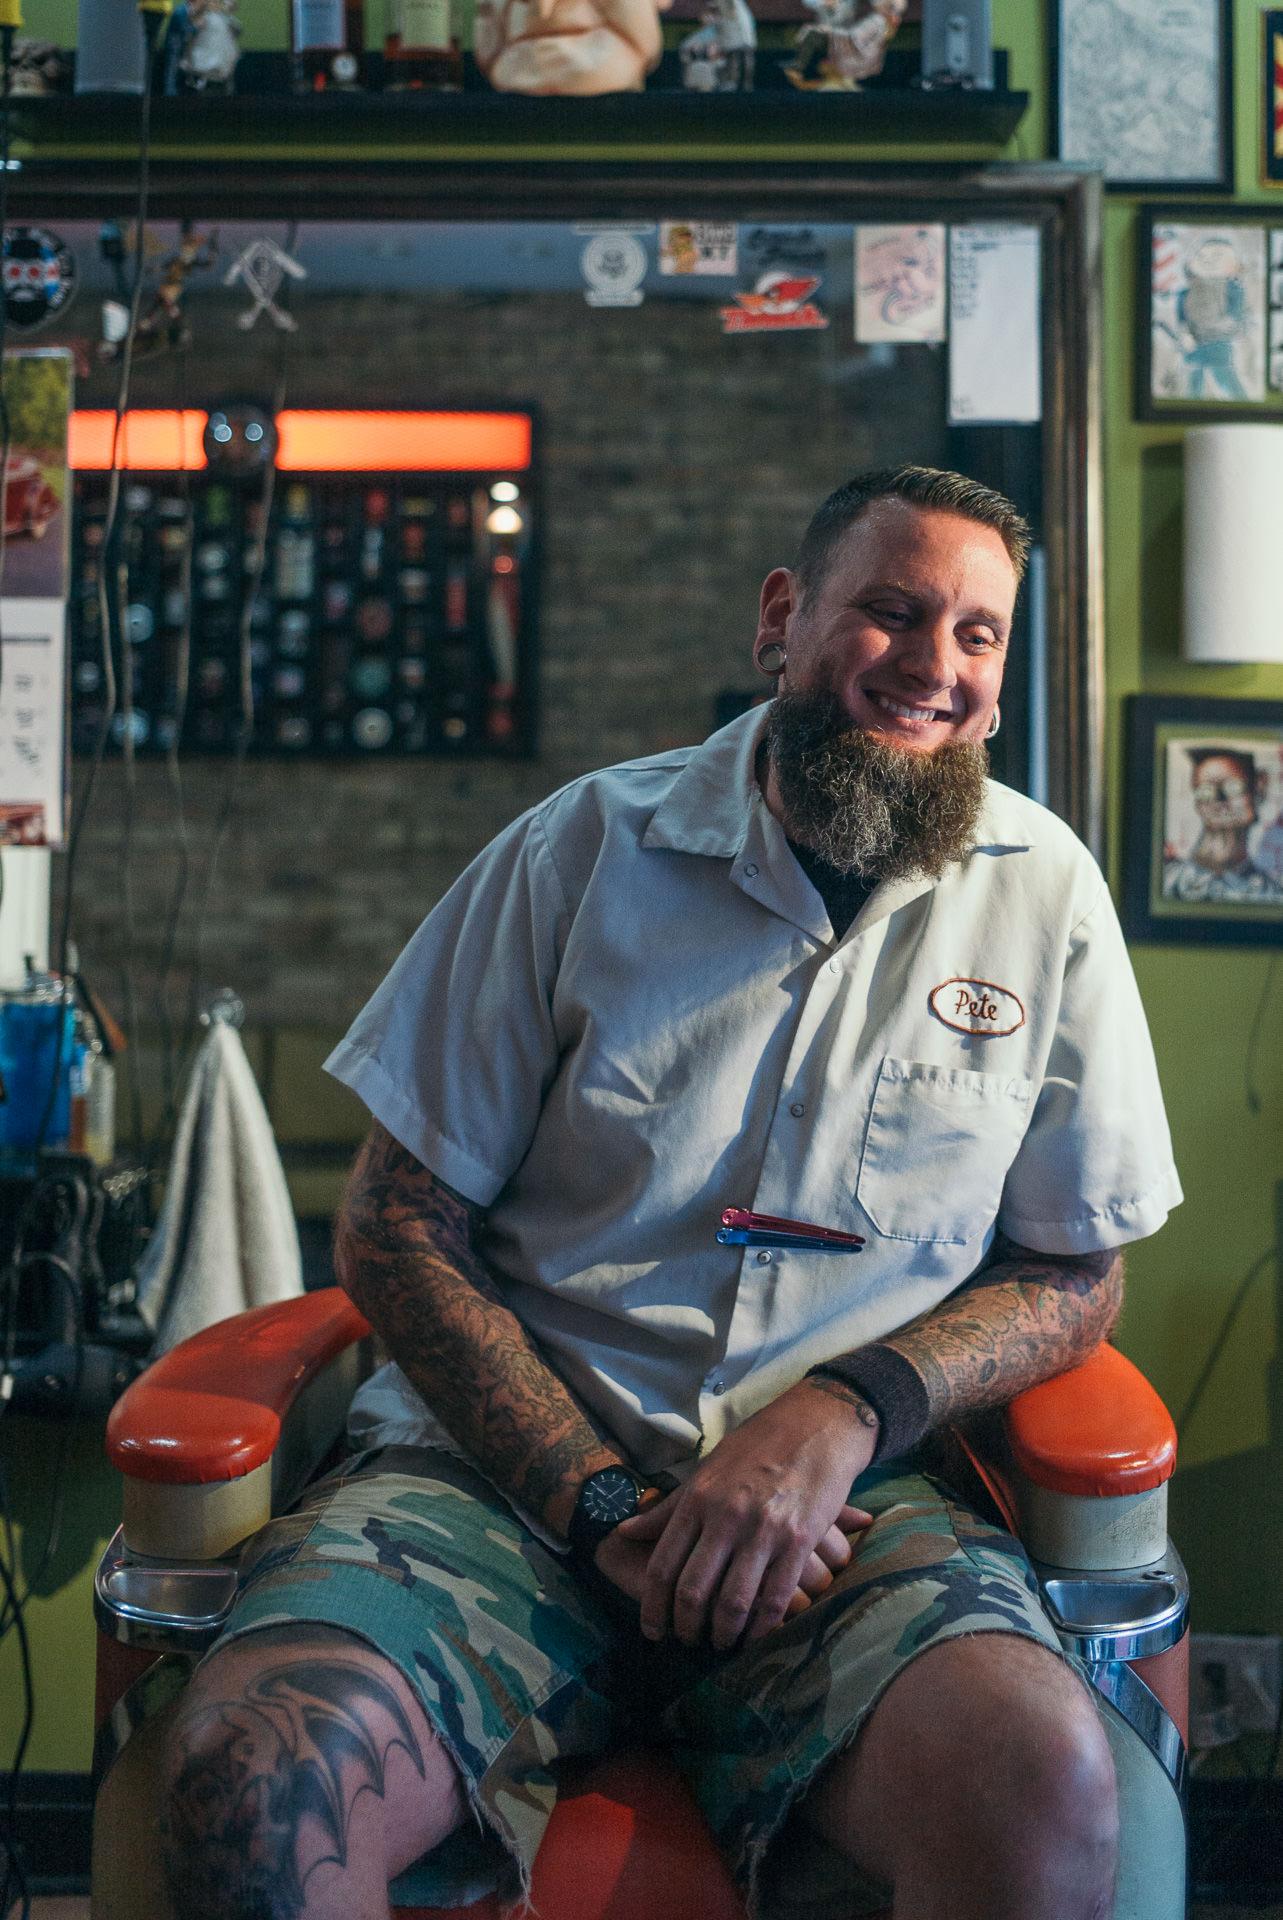 petes_barber_shop_chicago_pete.jpg